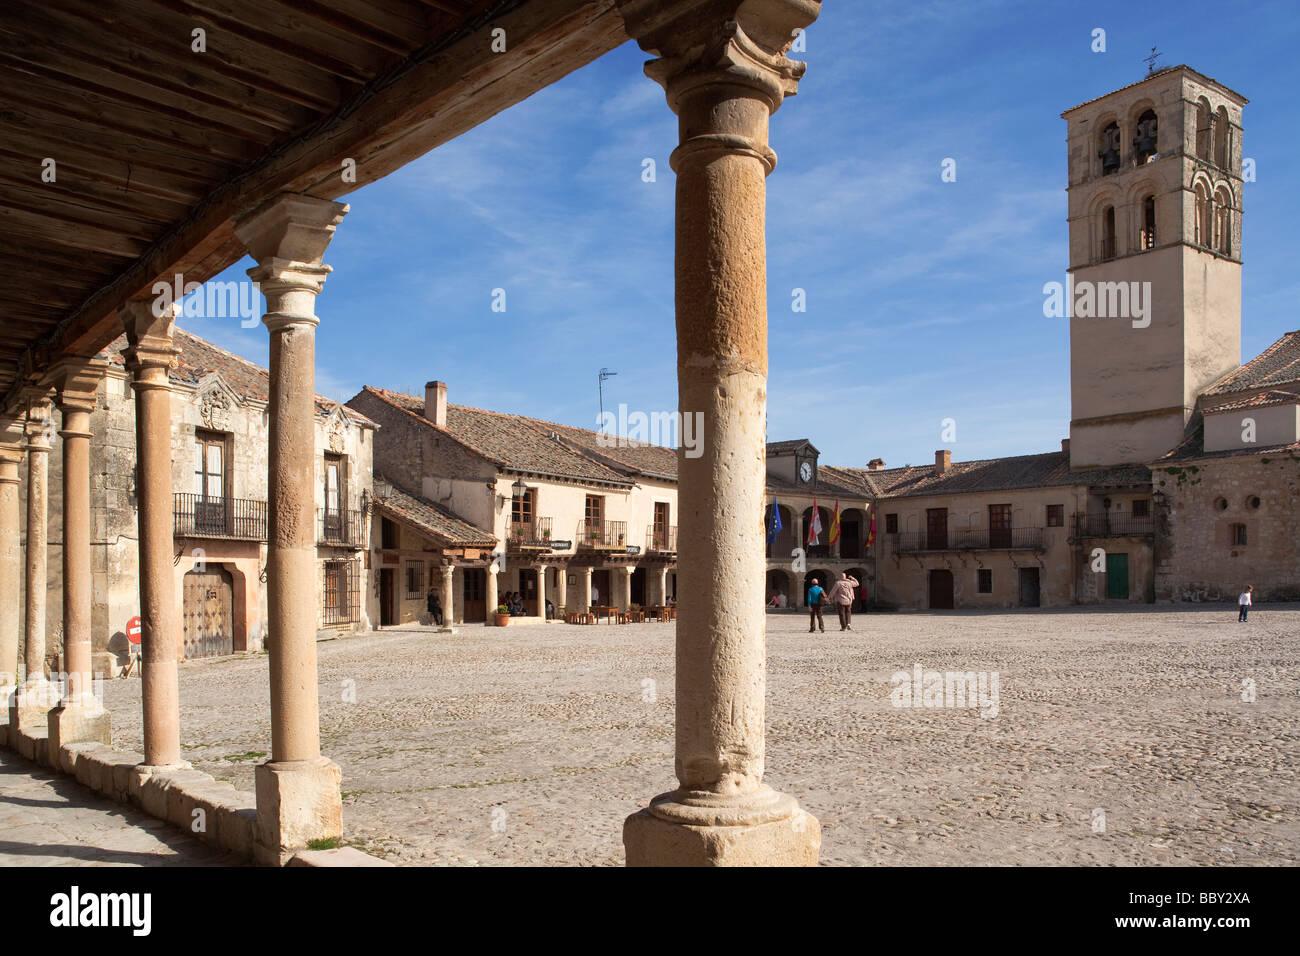 Town square Pedraza de la Sierra, Spain - Stock Image